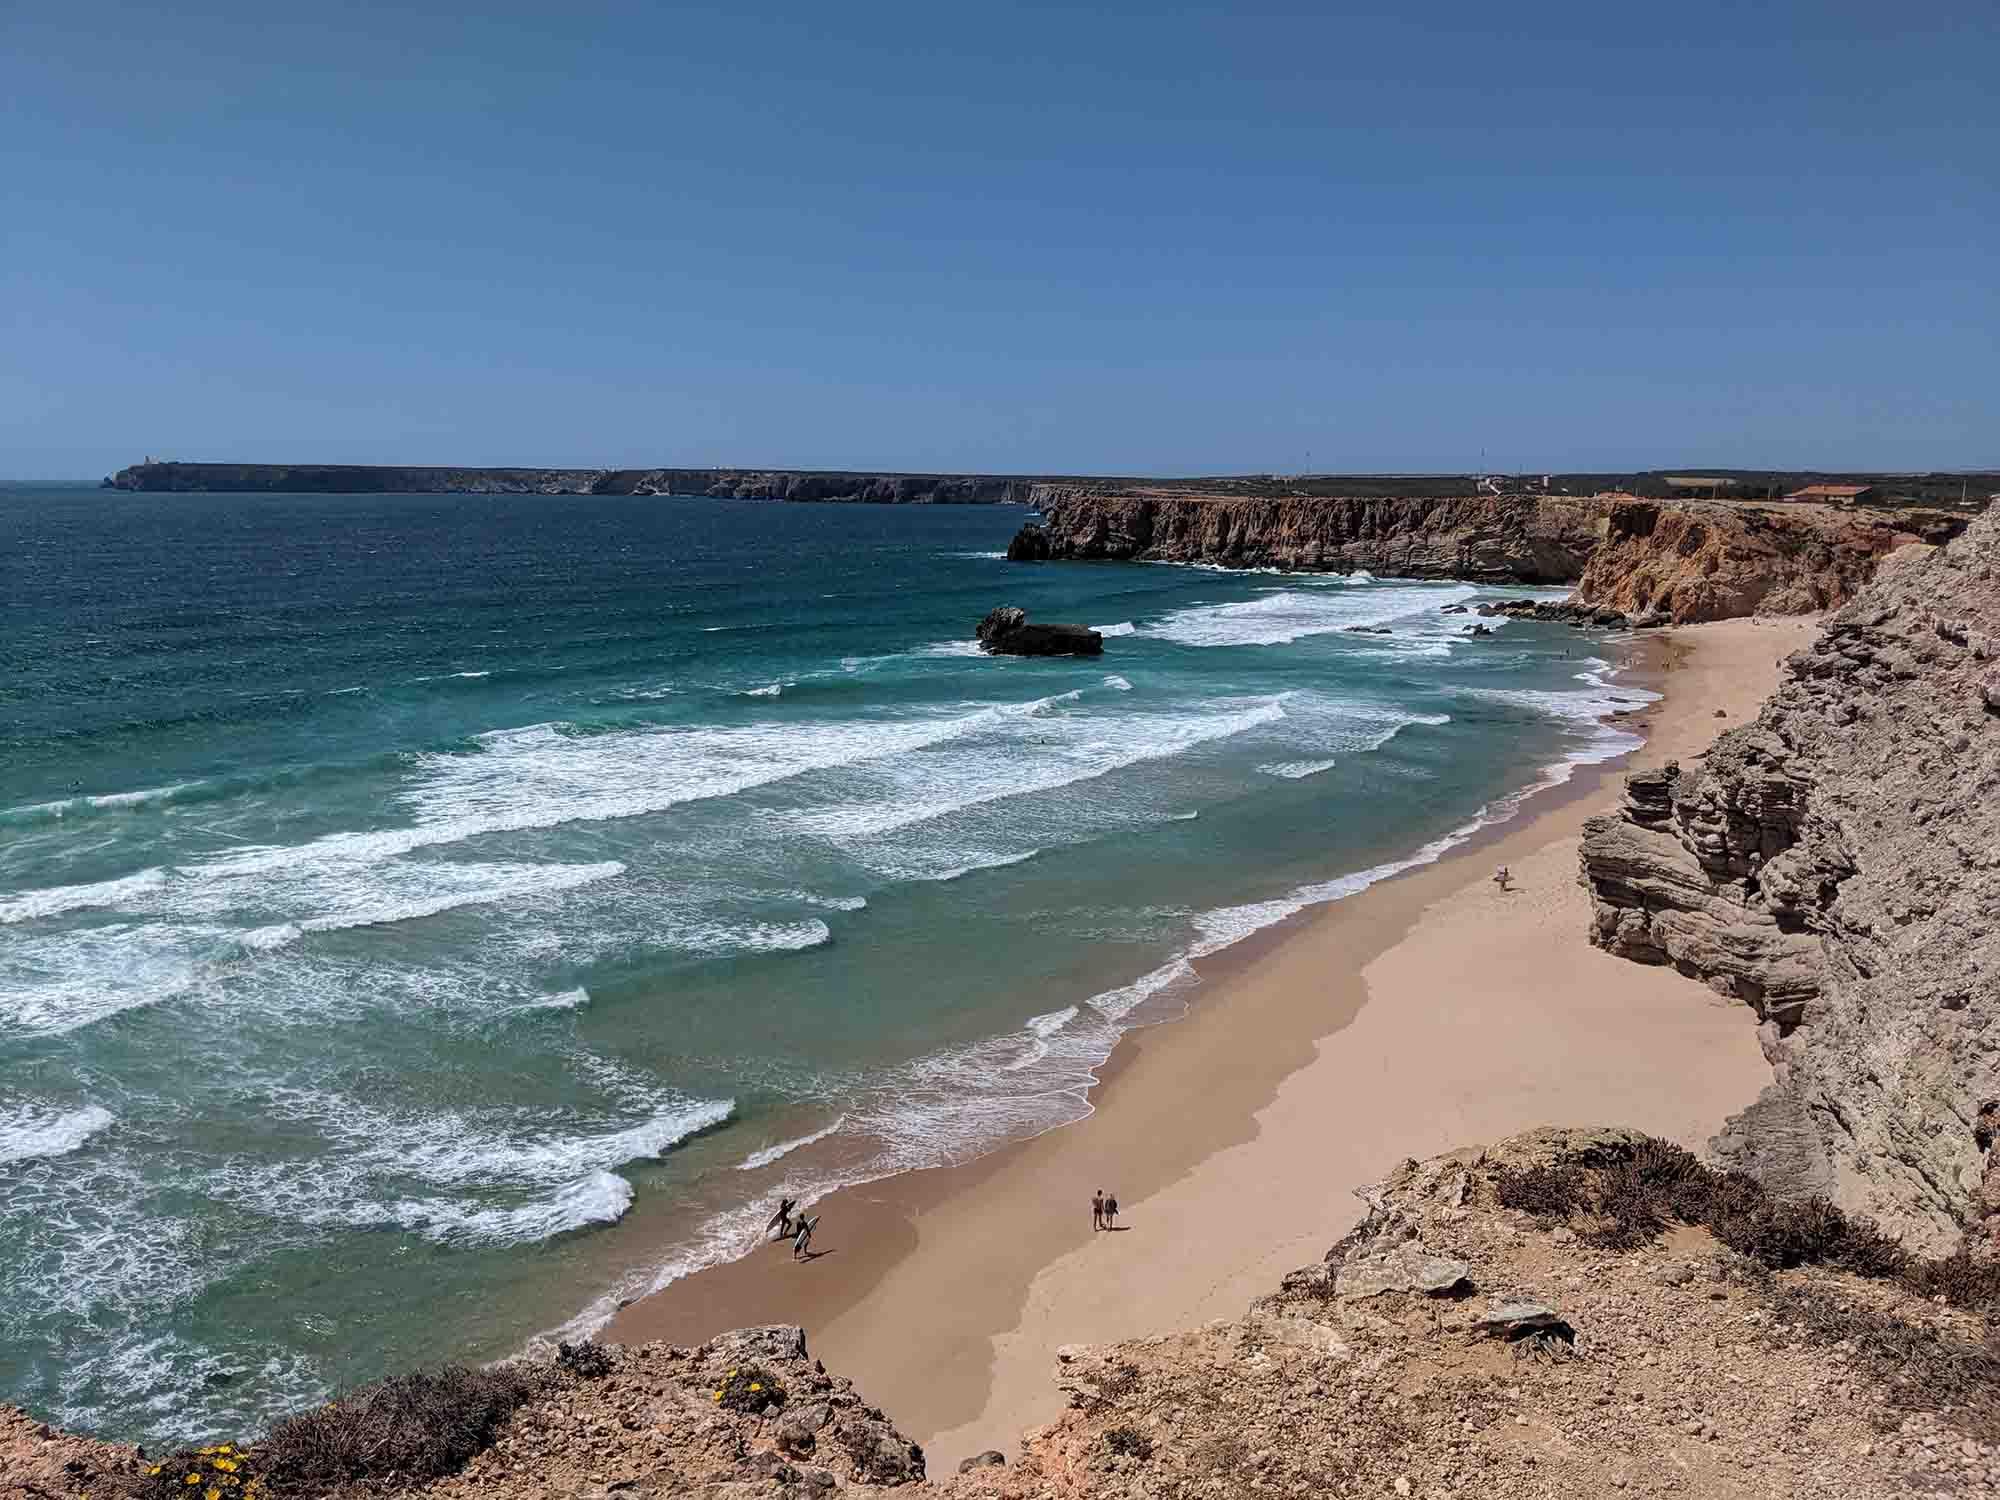 A beach near Sagres